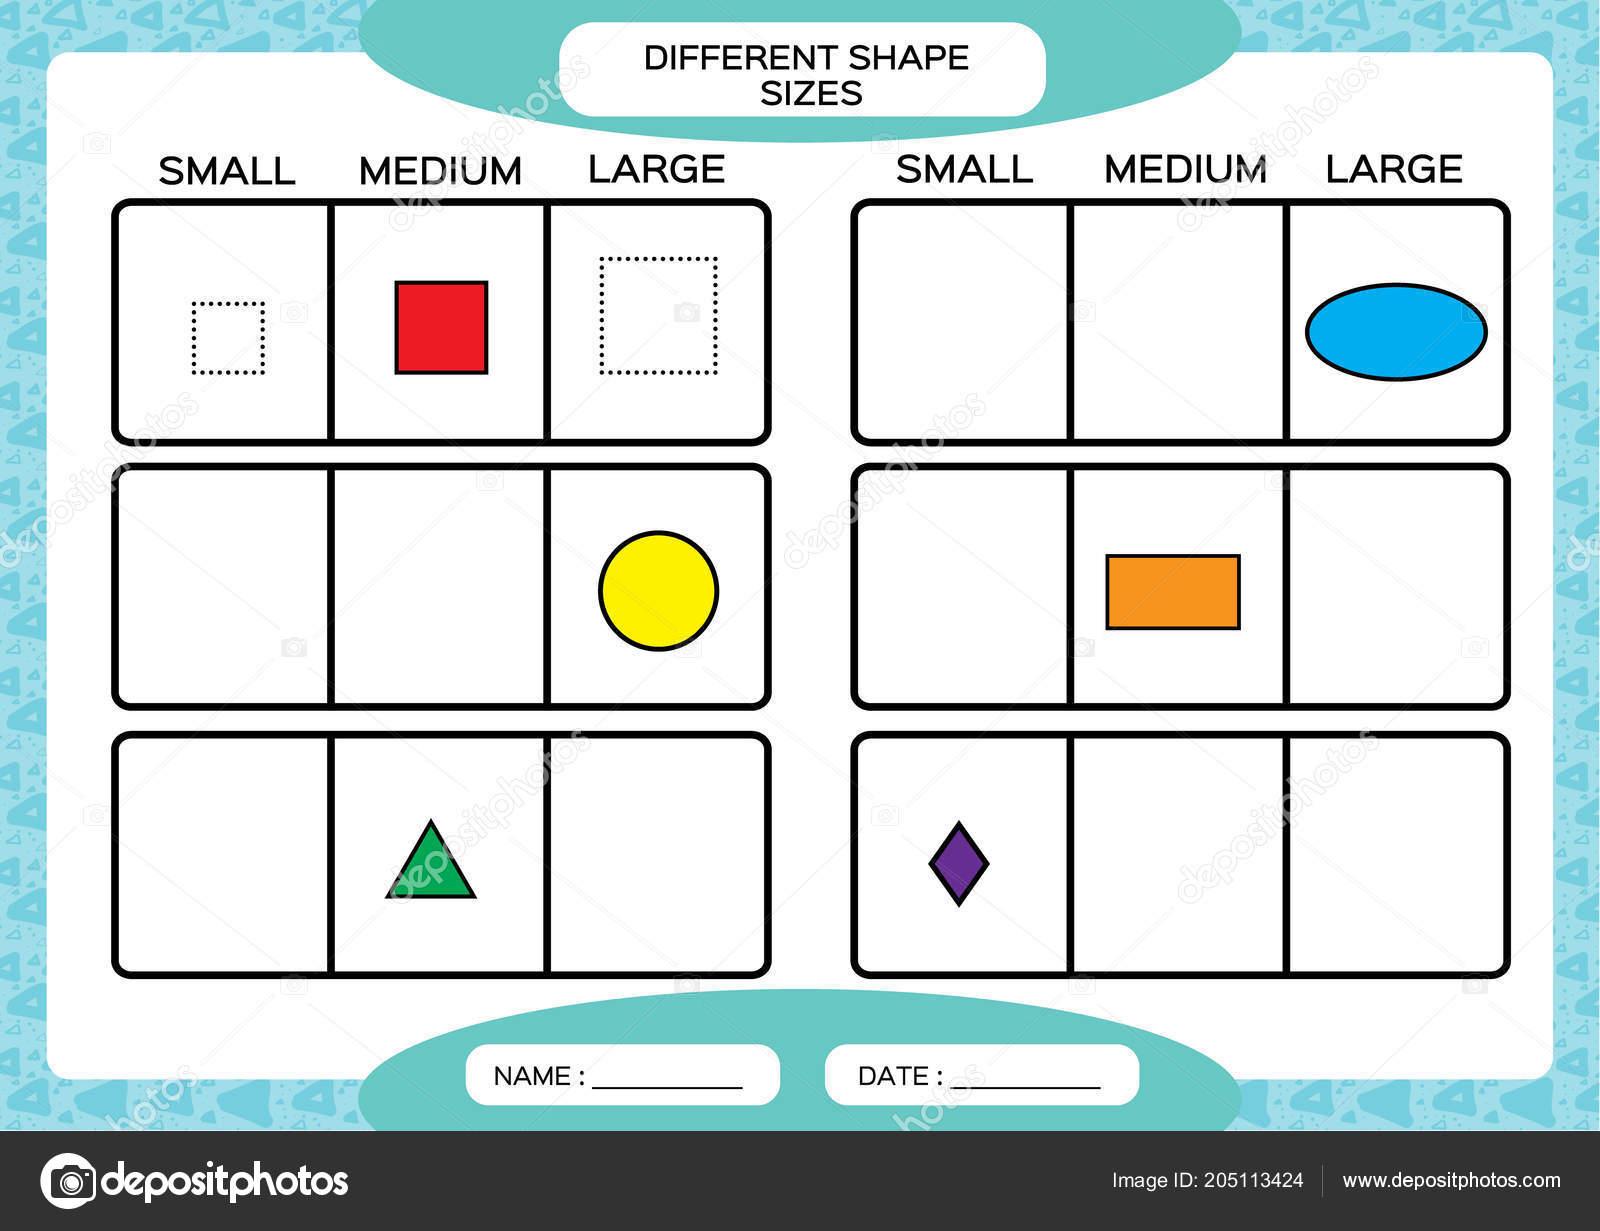 Practice Drawing Circles Worksheets